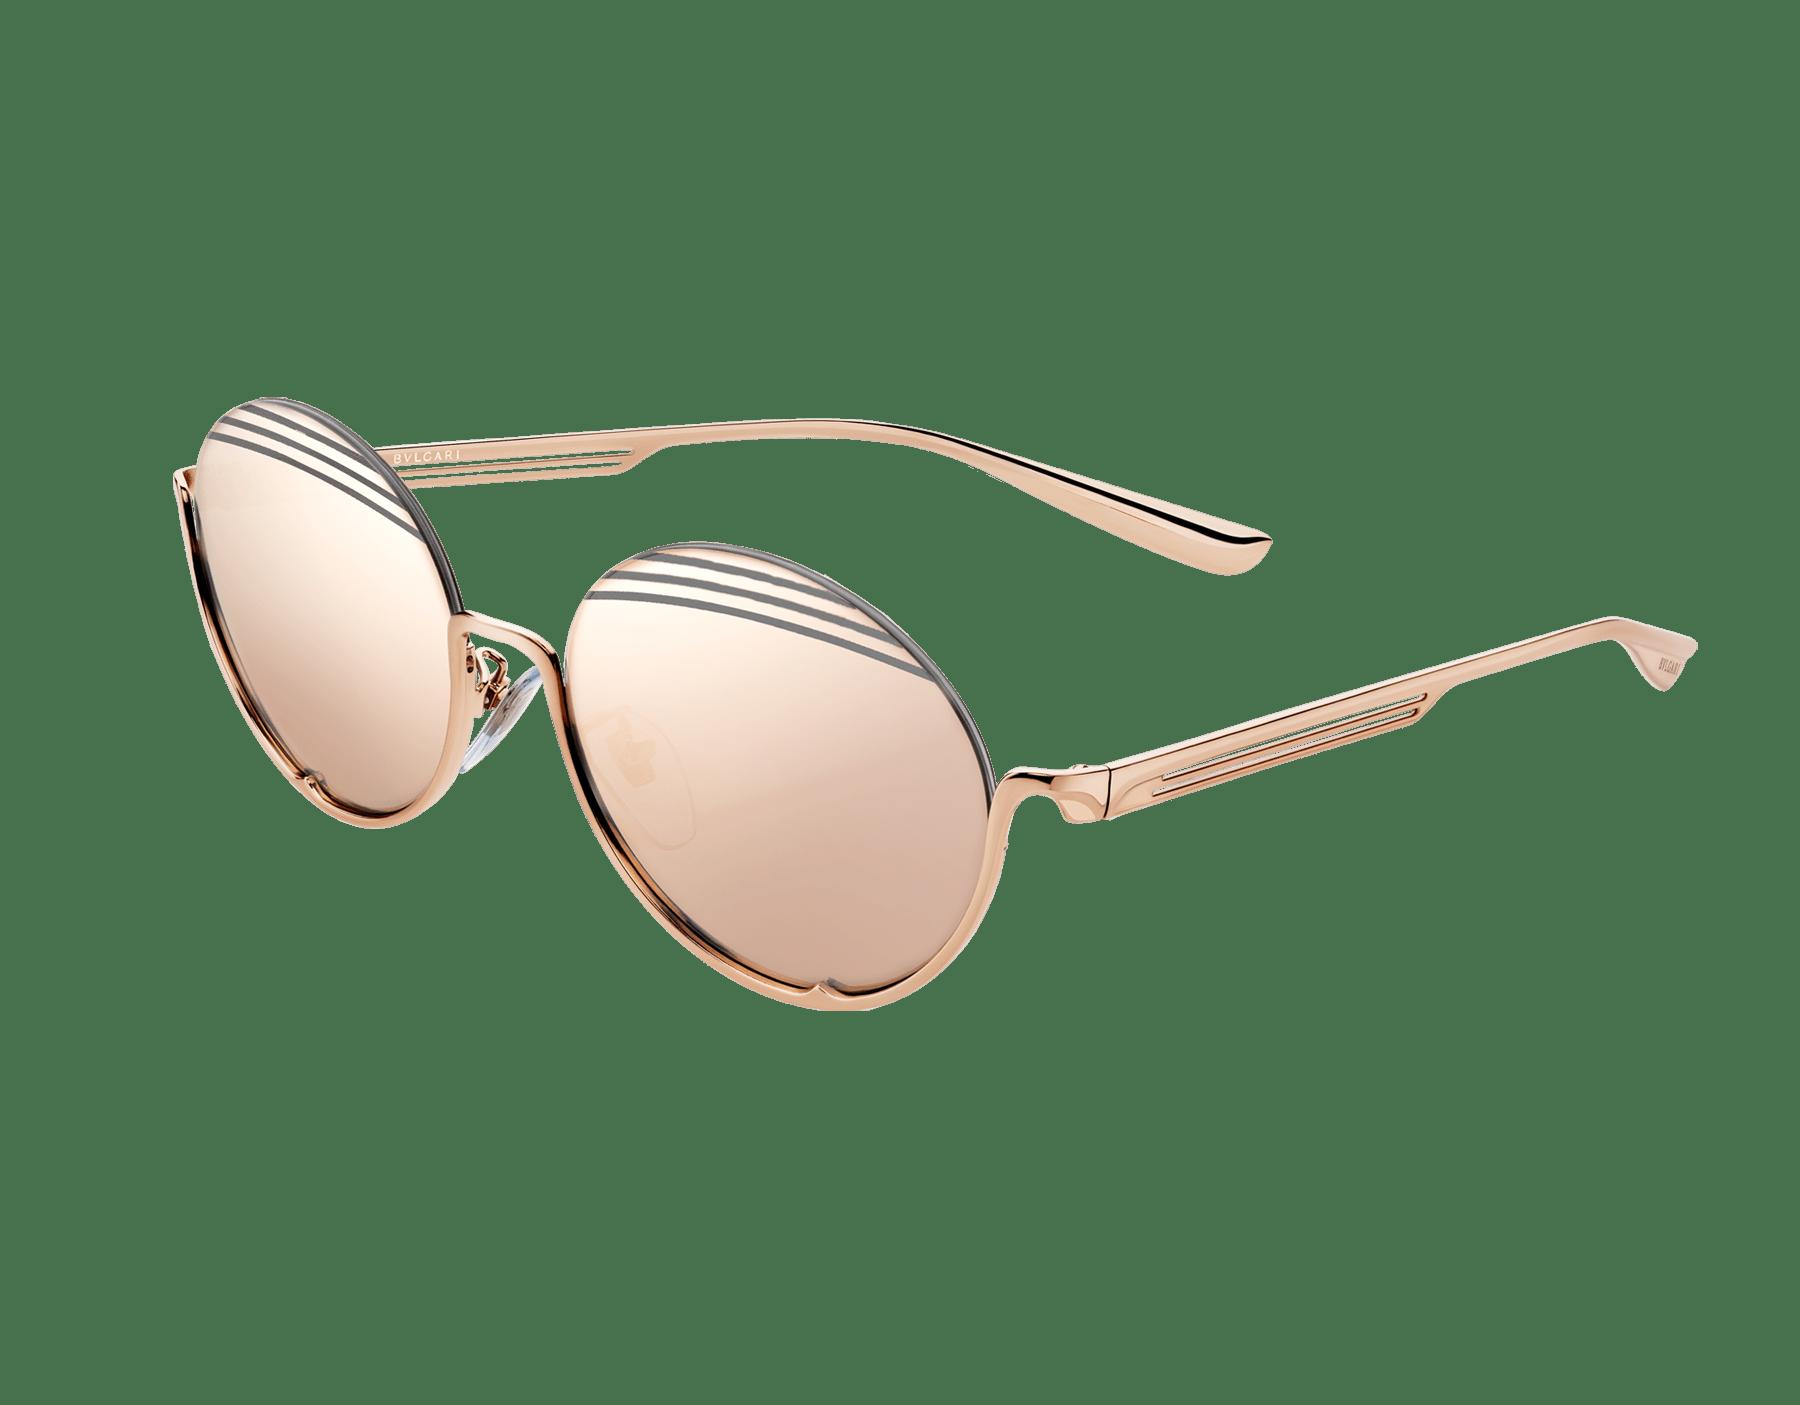 Bvlgari B.zero1 B.stripe semi-rimless oval metal sunglasses. 903713 image 1